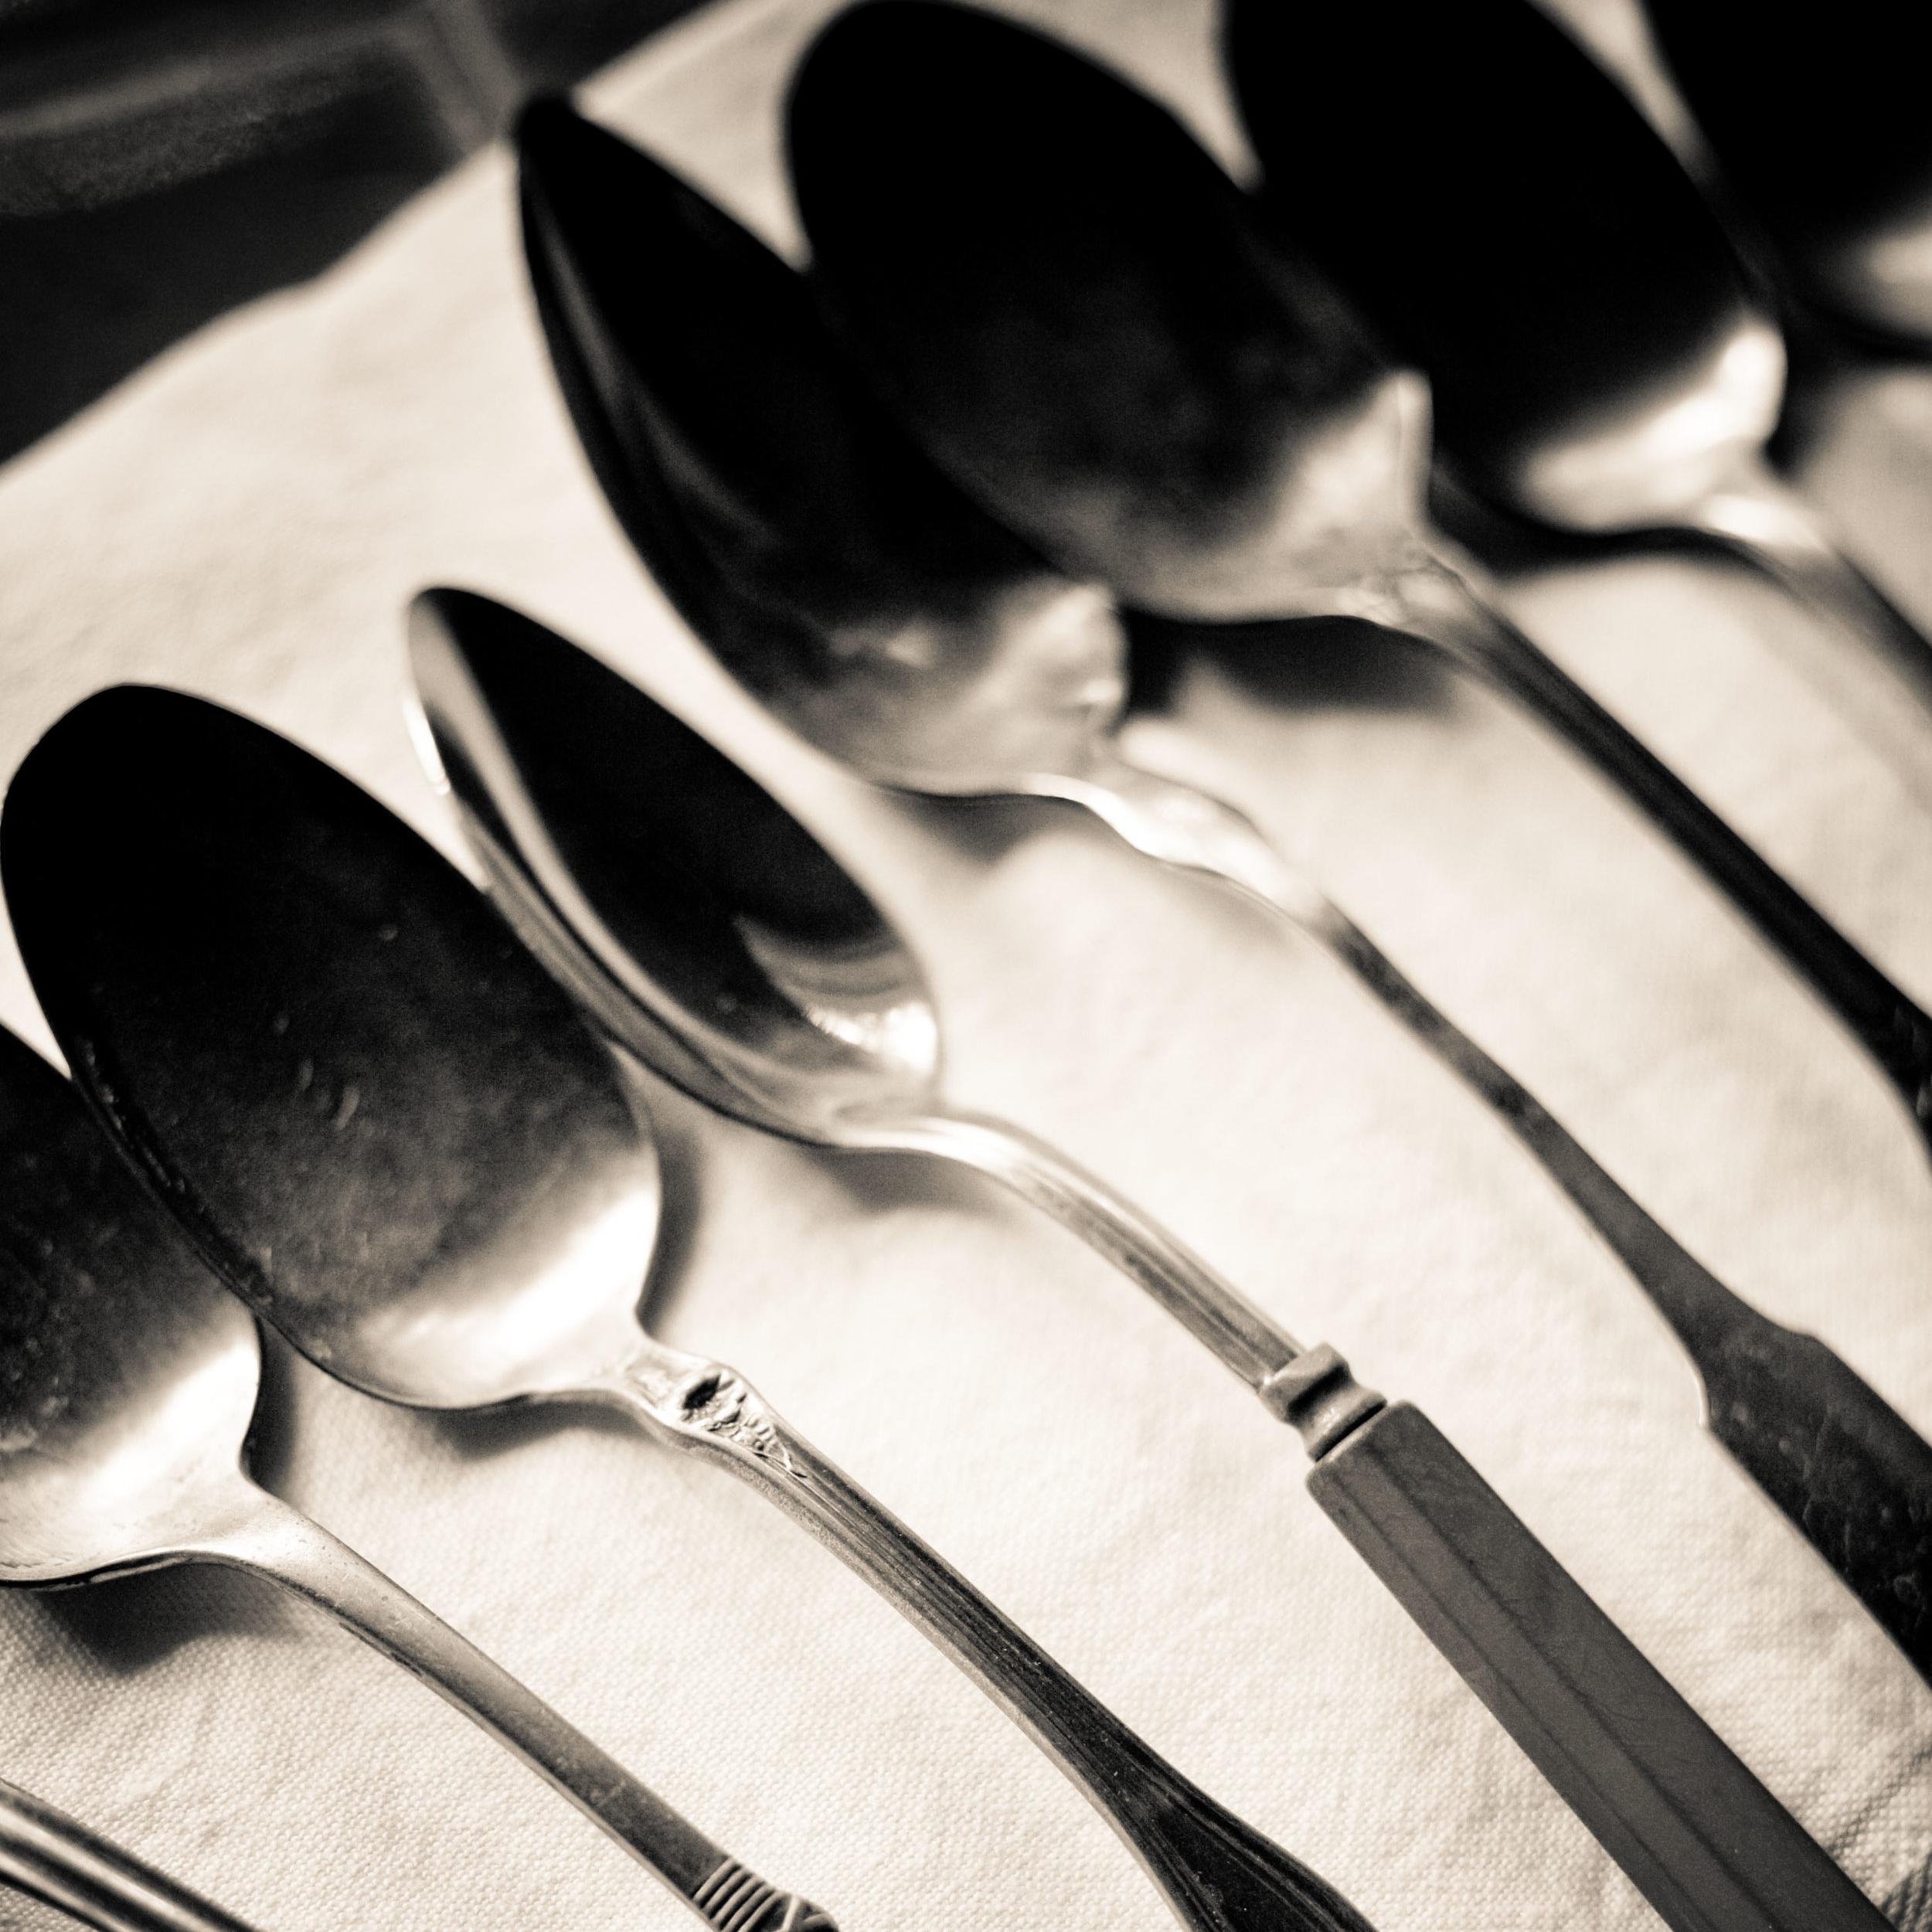 spoons-sara_shoot5_0258 copy.jpg